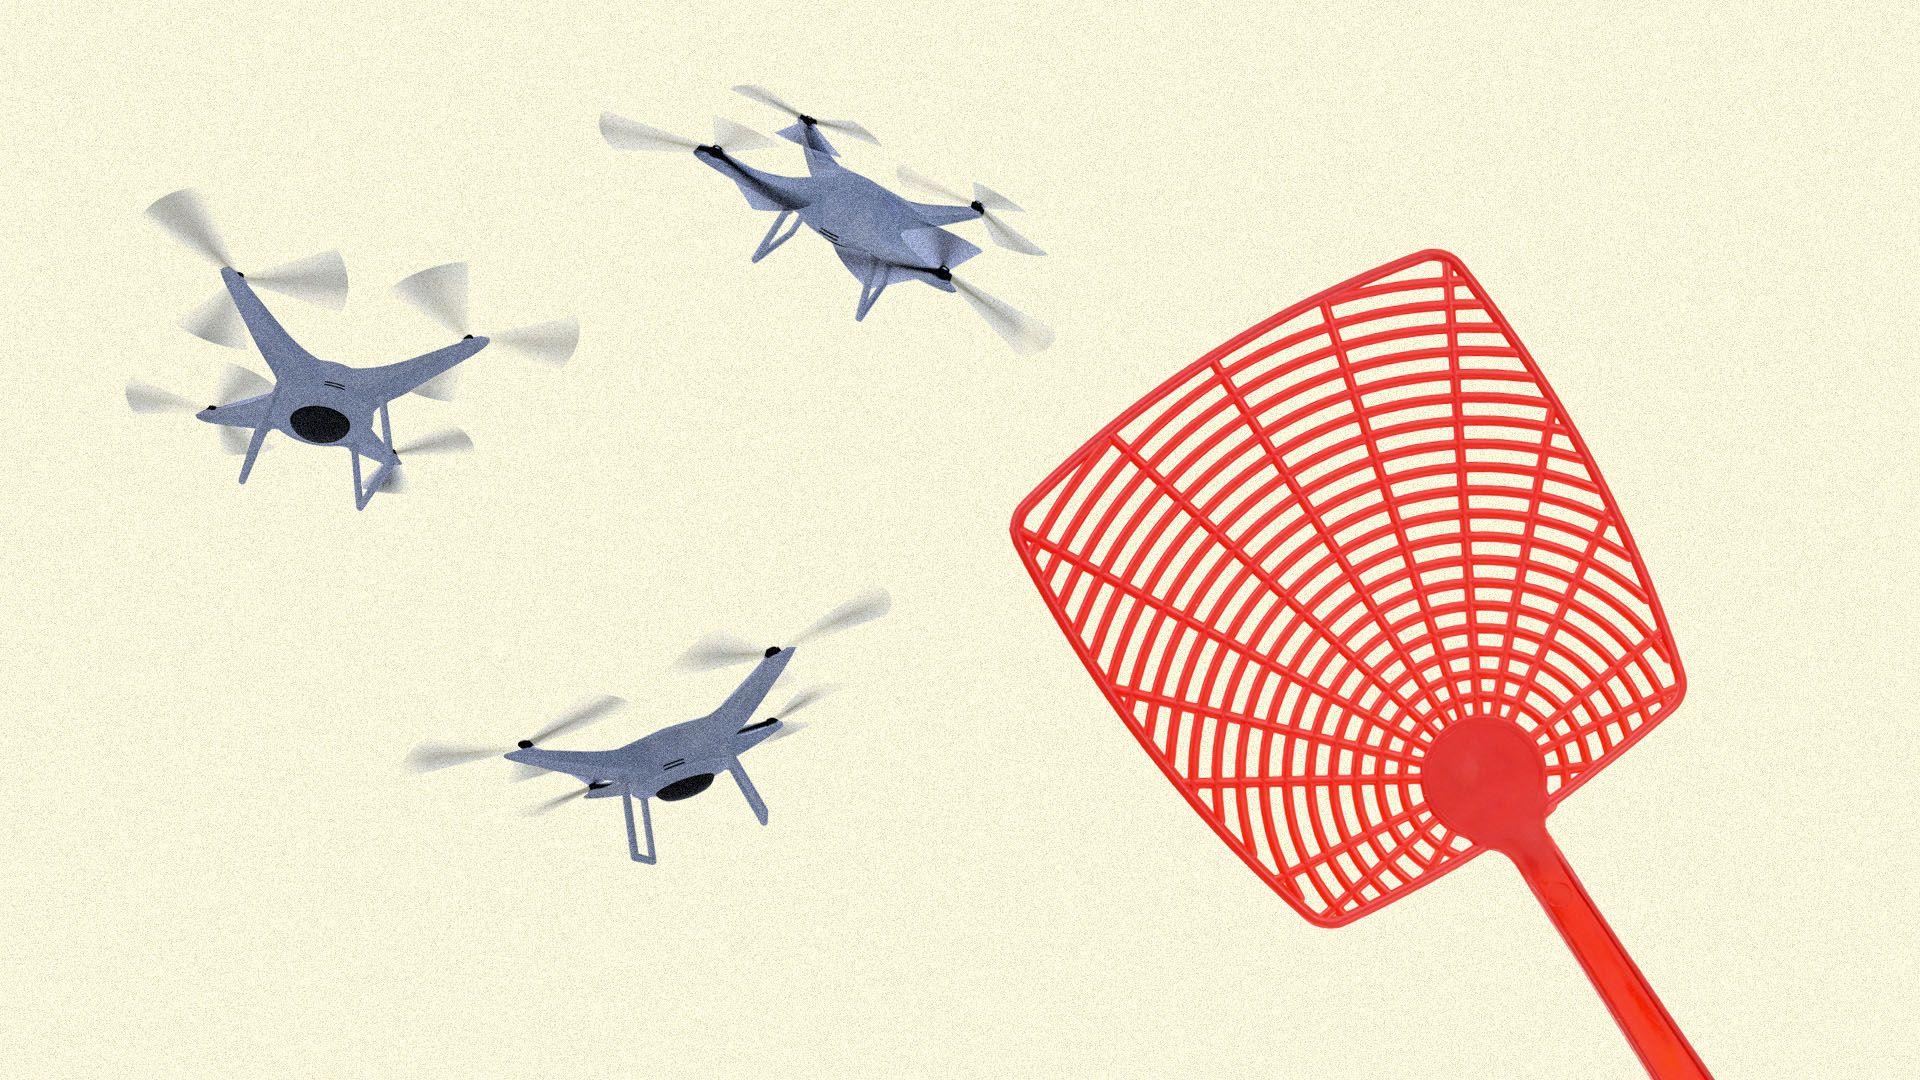 Illustration of drone buzzing near a giant flyswatter